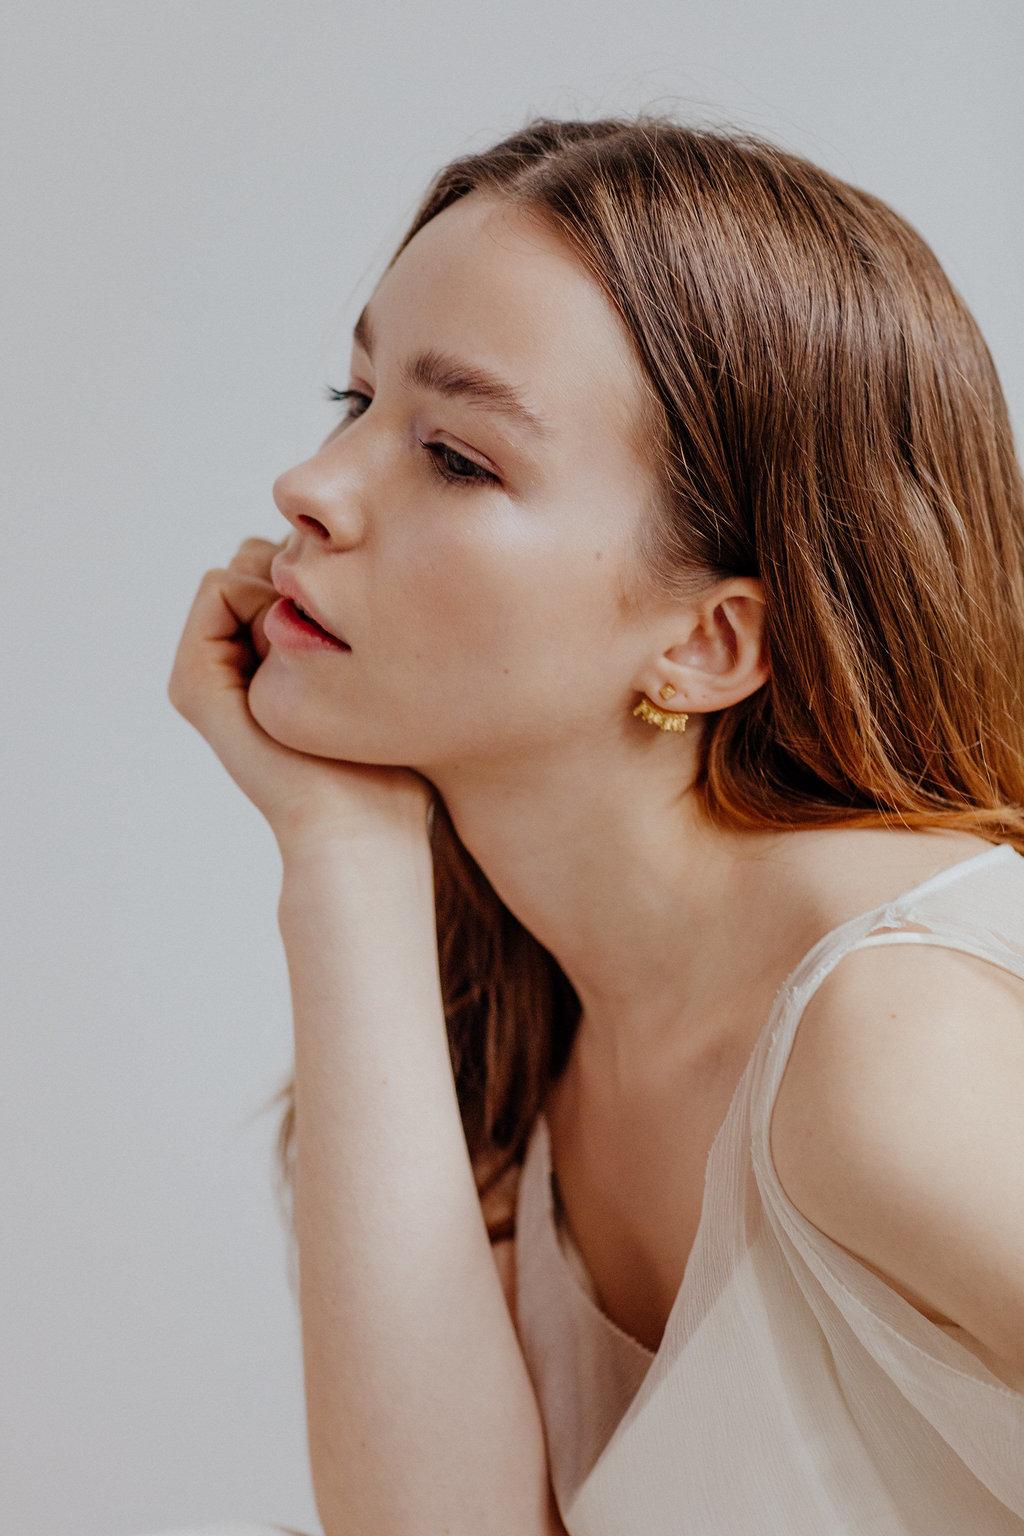 Blush-and-Bowties-Minimalist-Artisinal-Christine-Lim-033.JPG